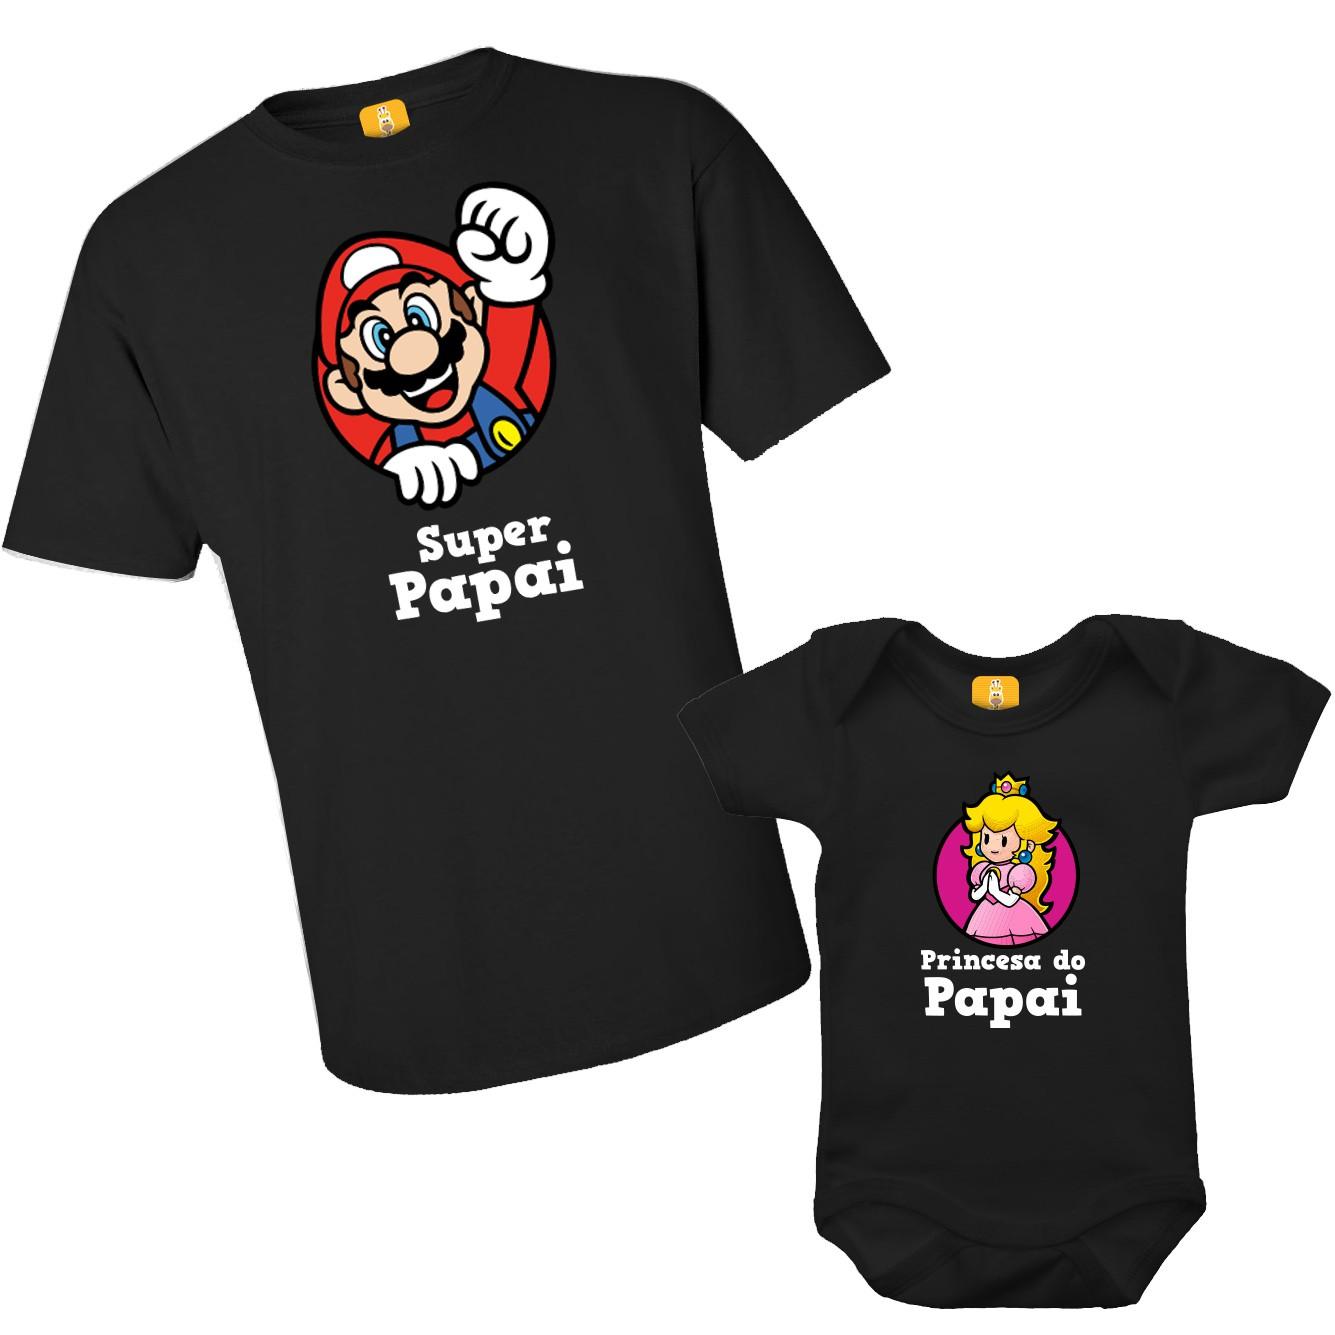 Kit camiseta e body - Tal Pai Tal filho Super Mario e Princesa do papai